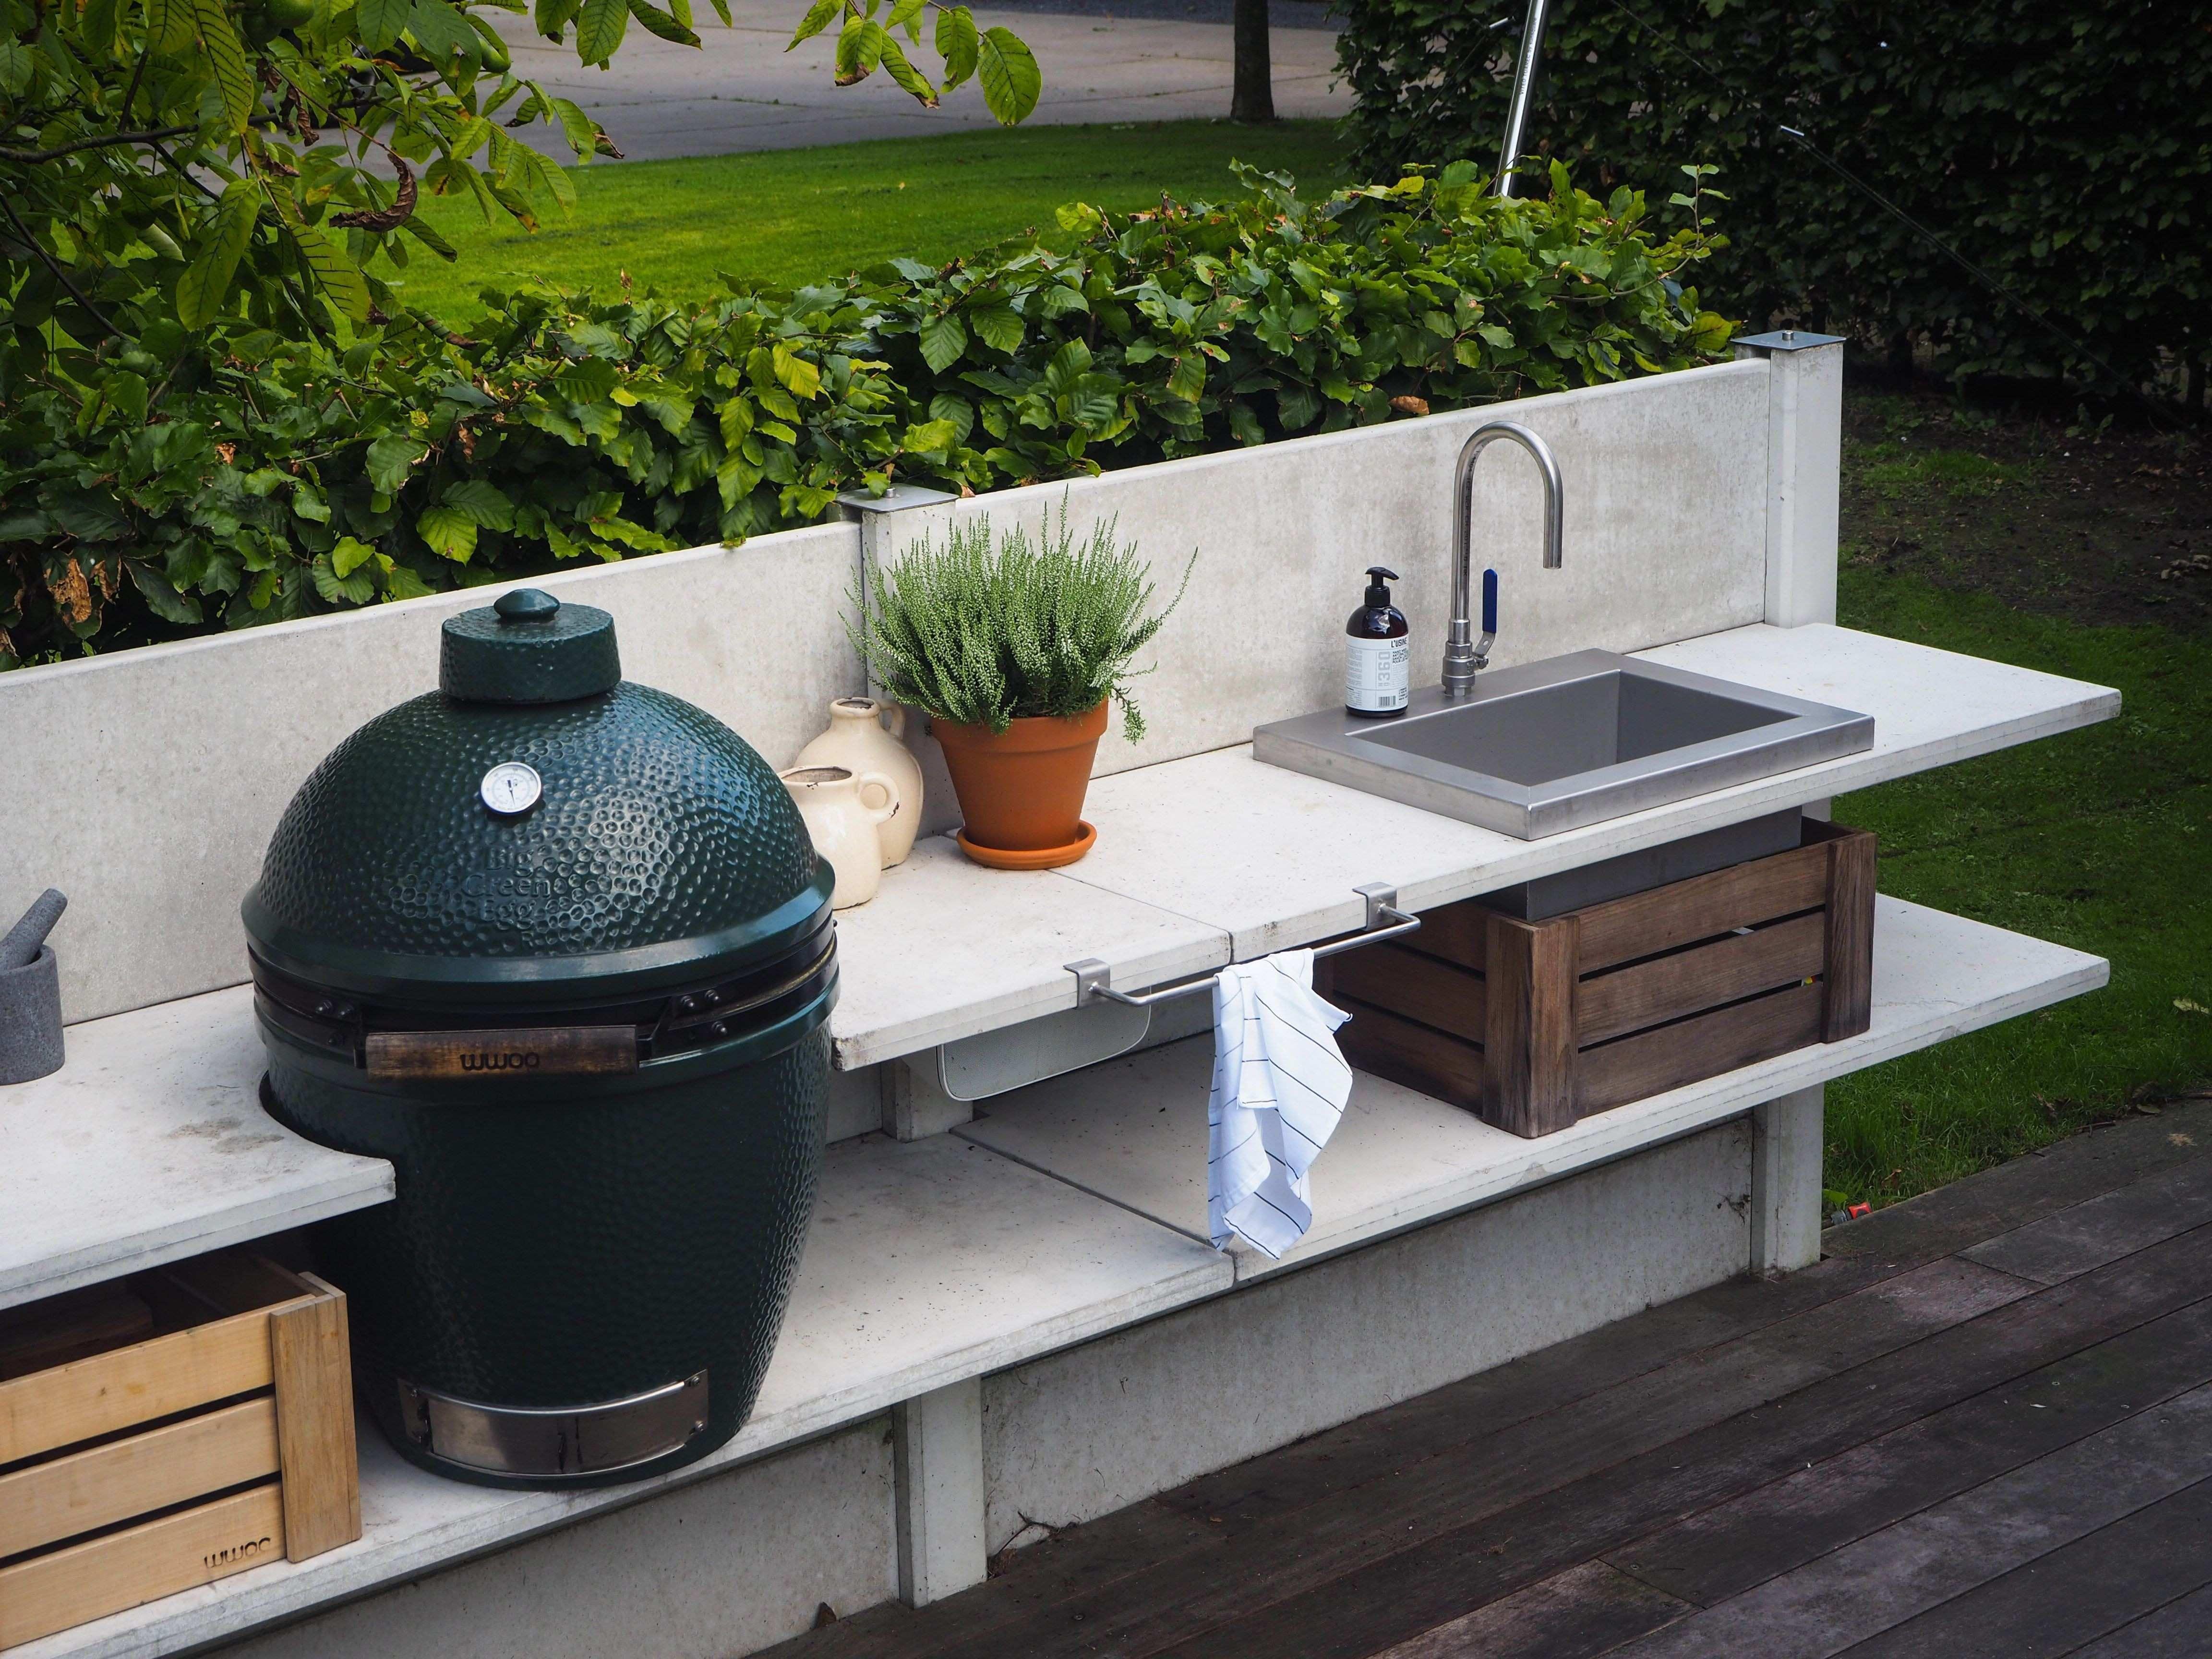 90 Best Wwoo Outdoor Kitchen Images On Pinterest Outdoor Kitchen Lighting Big Green Egg Outdoor Kitchen Kitchen Lighting Over Table